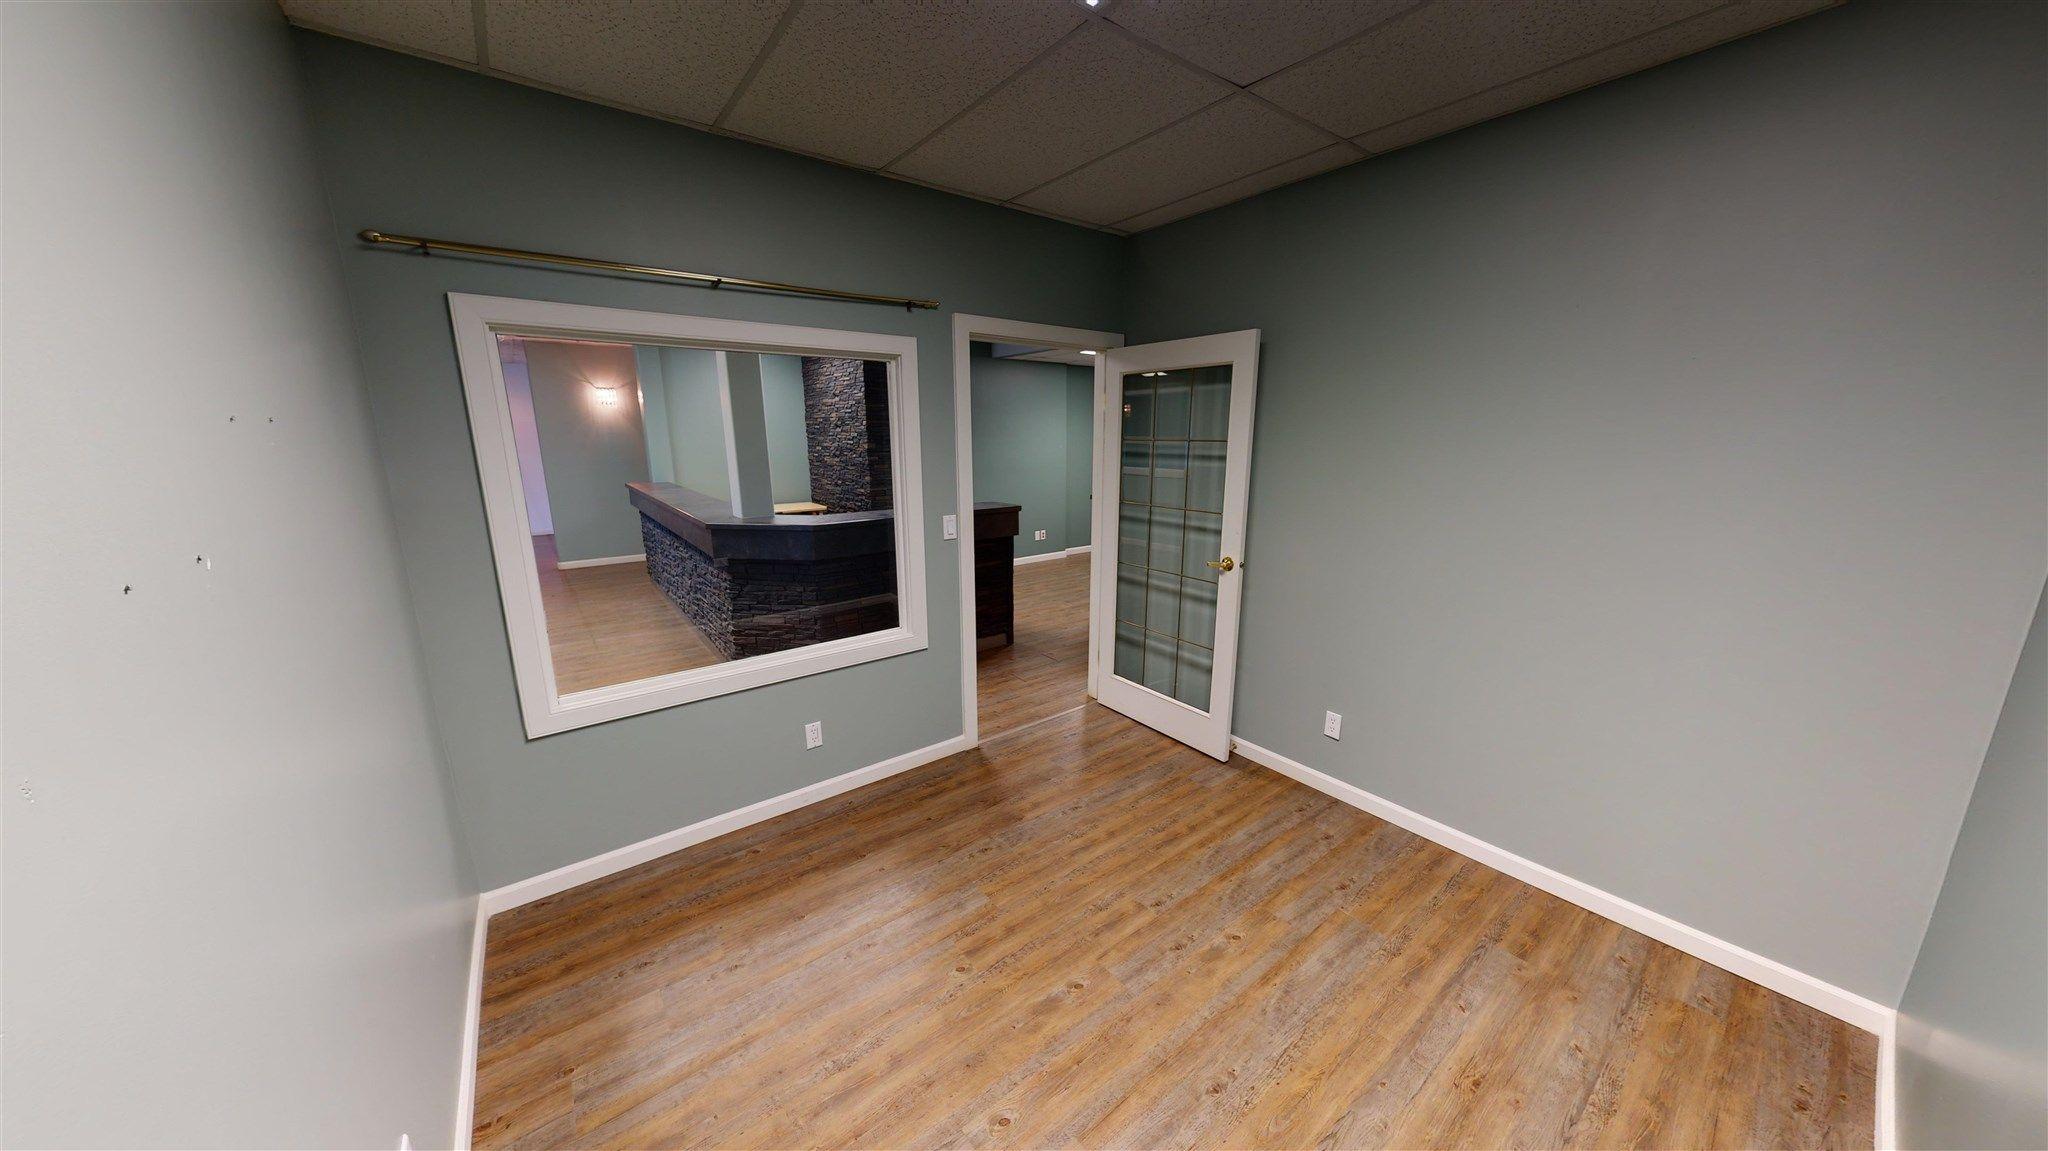 Photo 9: Photos: 10067 100 Avenue in Fort St. John: Fort St. John - City NW Office for sale (Fort St. John (Zone 60))  : MLS®# C8039097